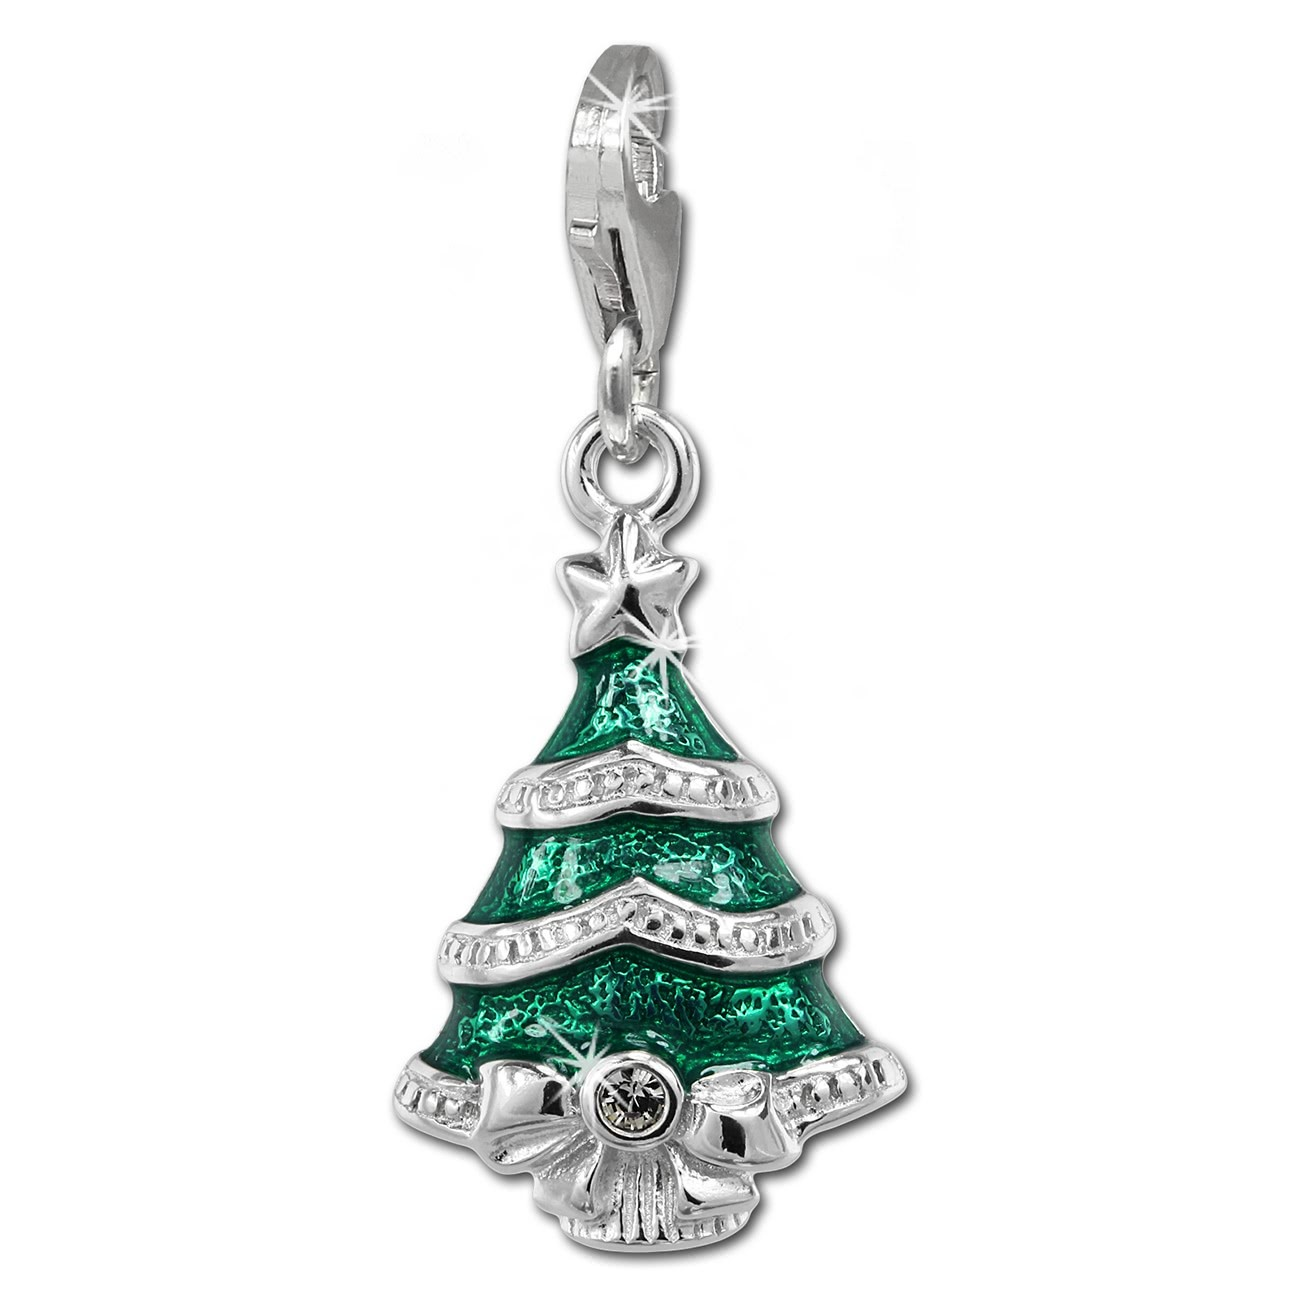 SilberDream Charm Weihnachtsbaum 925 Silber Armband Anhänger FC849G